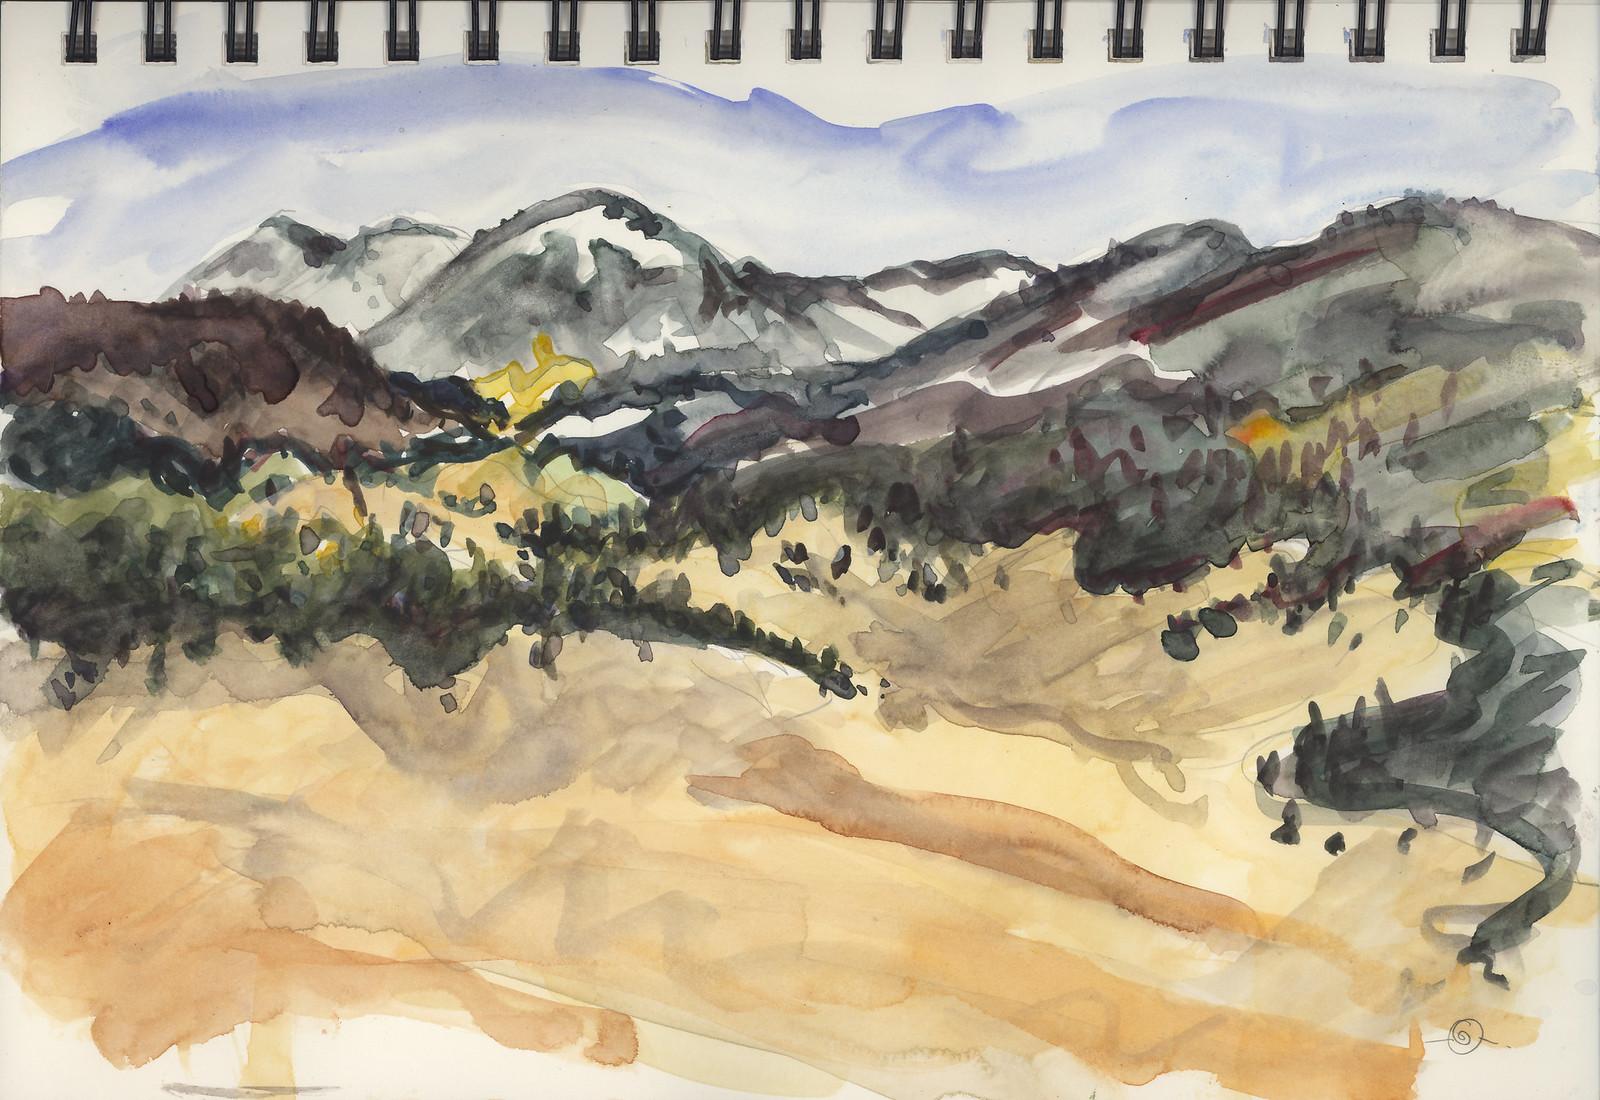 Valles Caldera rimmed by Jemez Mountains